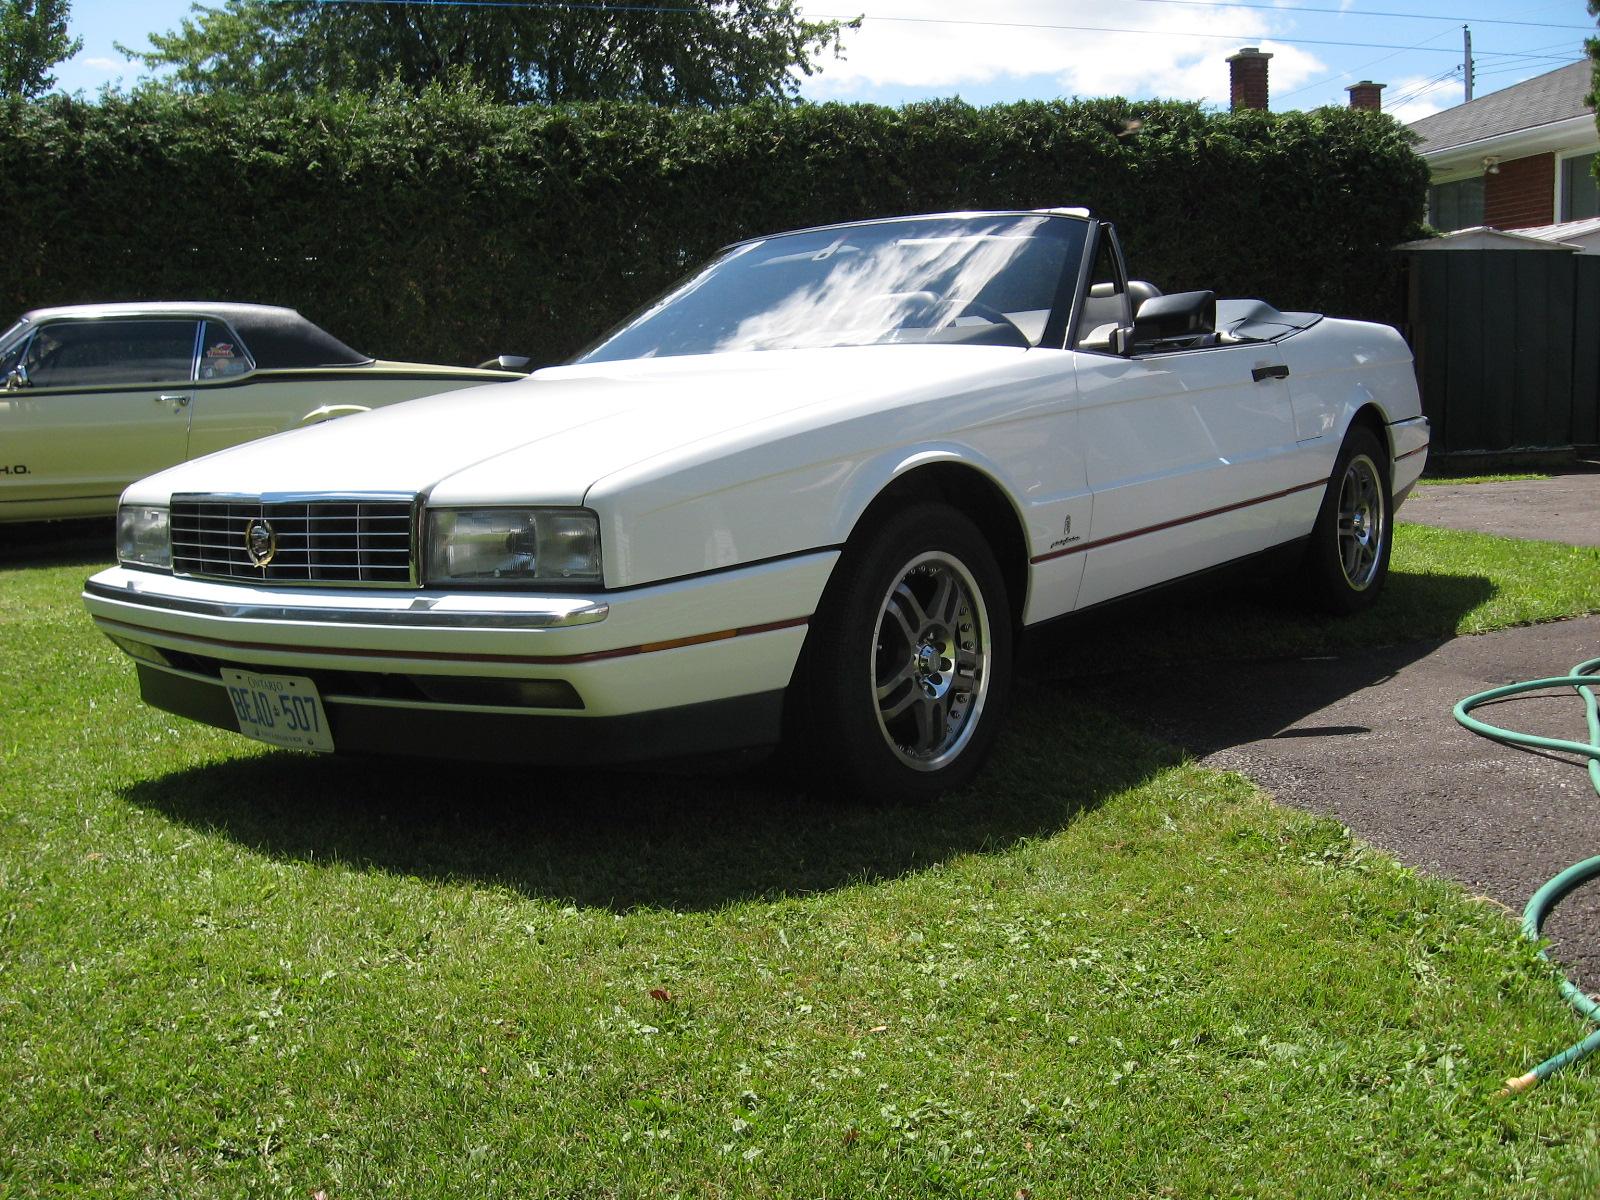 Cadillac Allante Pininfarina Roadster - 15